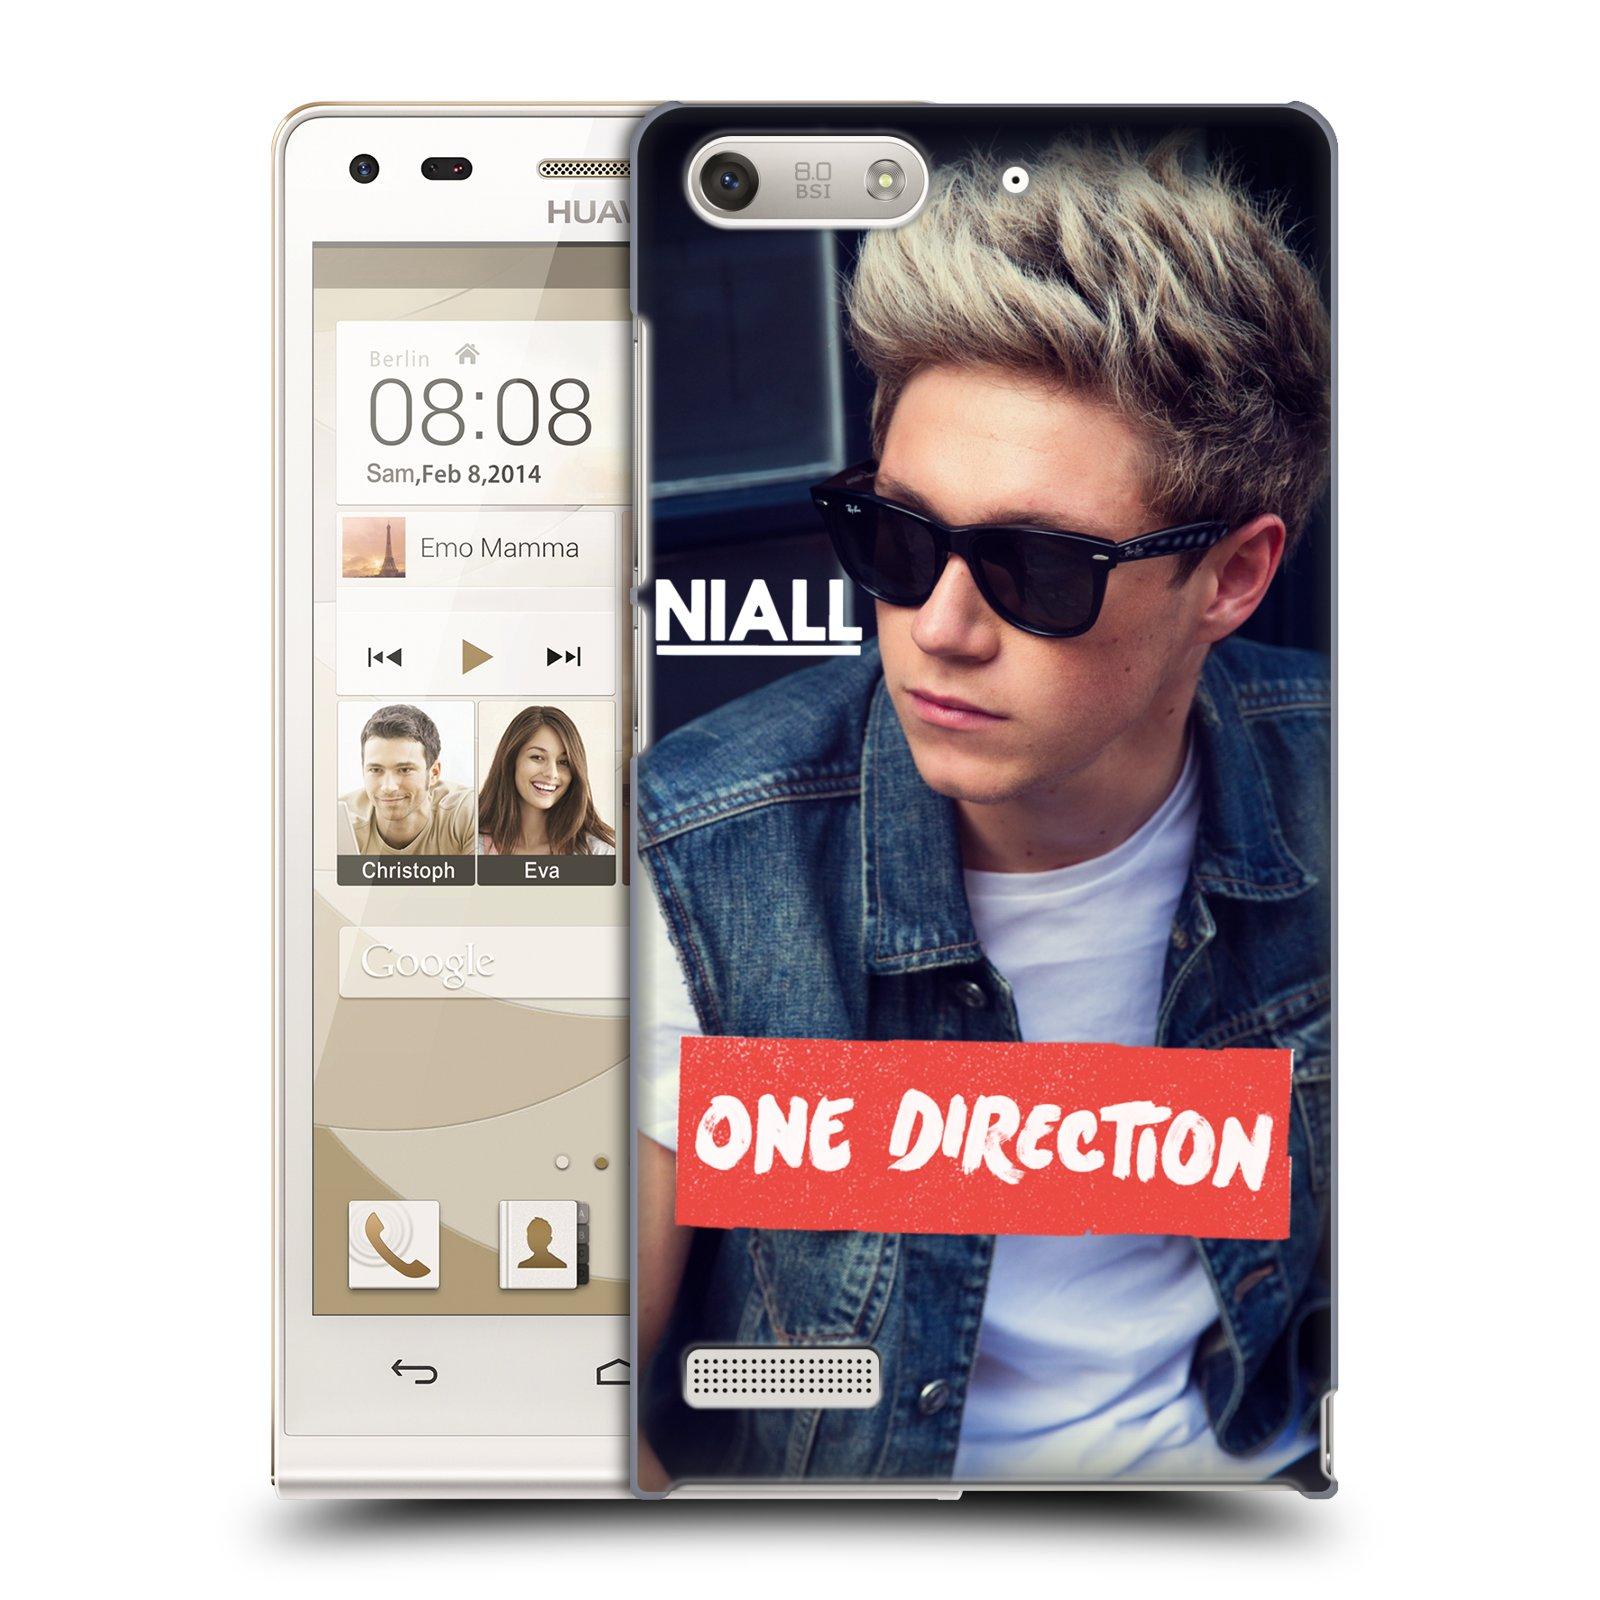 Plastové pouzdro na mobil Huawei Ascend G6 HEAD CASE One Direction - Niall (Kryt či obal One Direction Official na mobilní telefon Huawei Ascend G6 bez LTE)